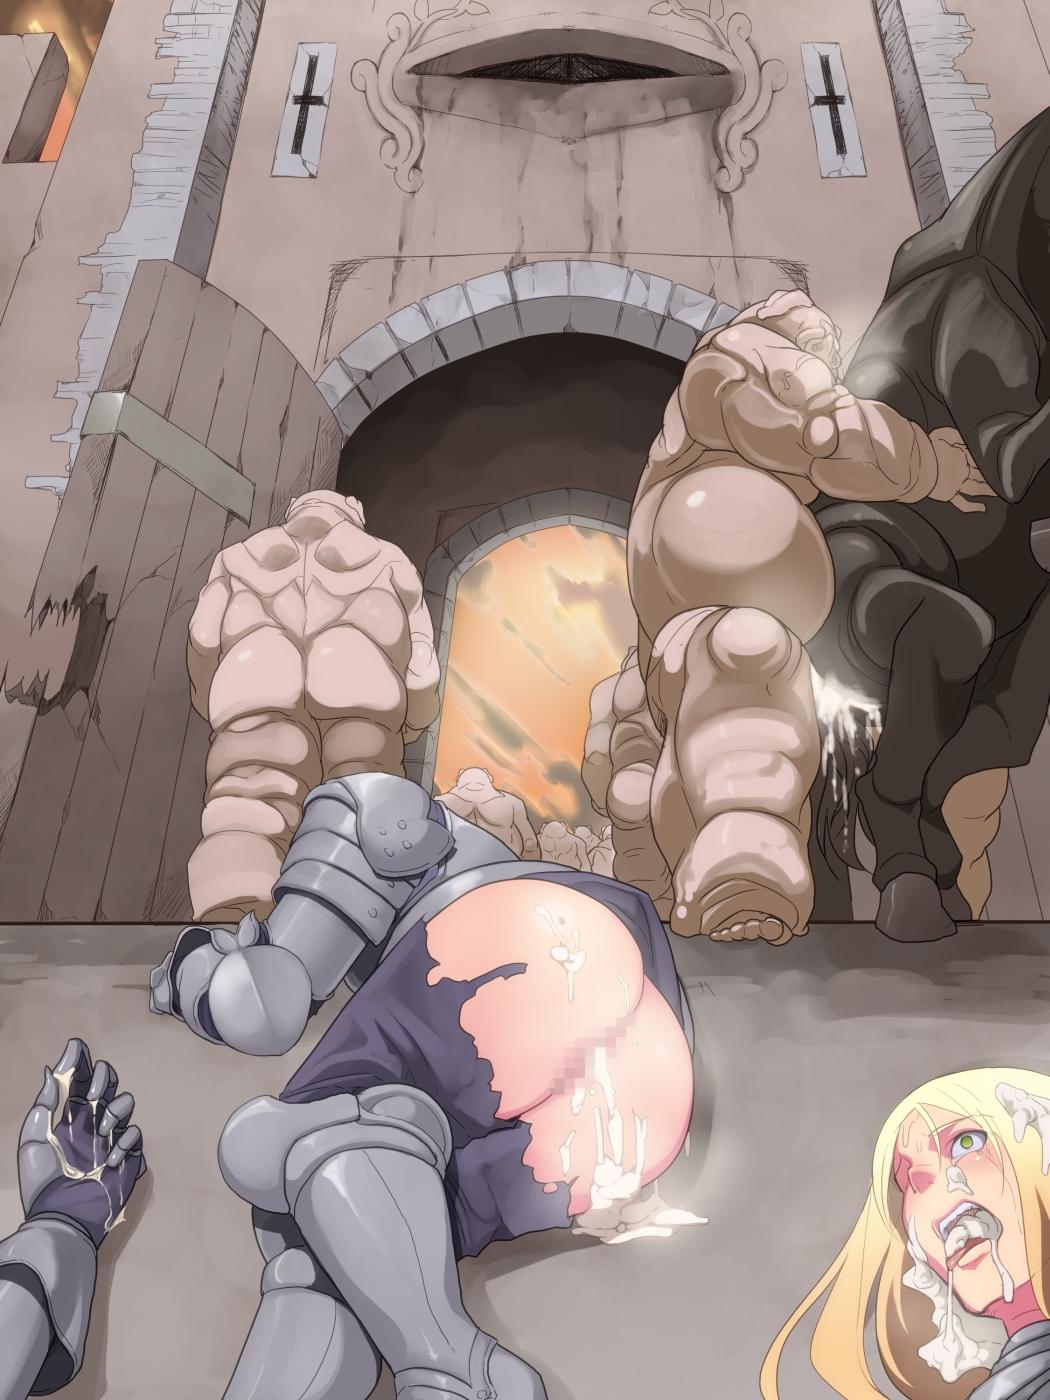 die must orcs Zero suit samus tied up